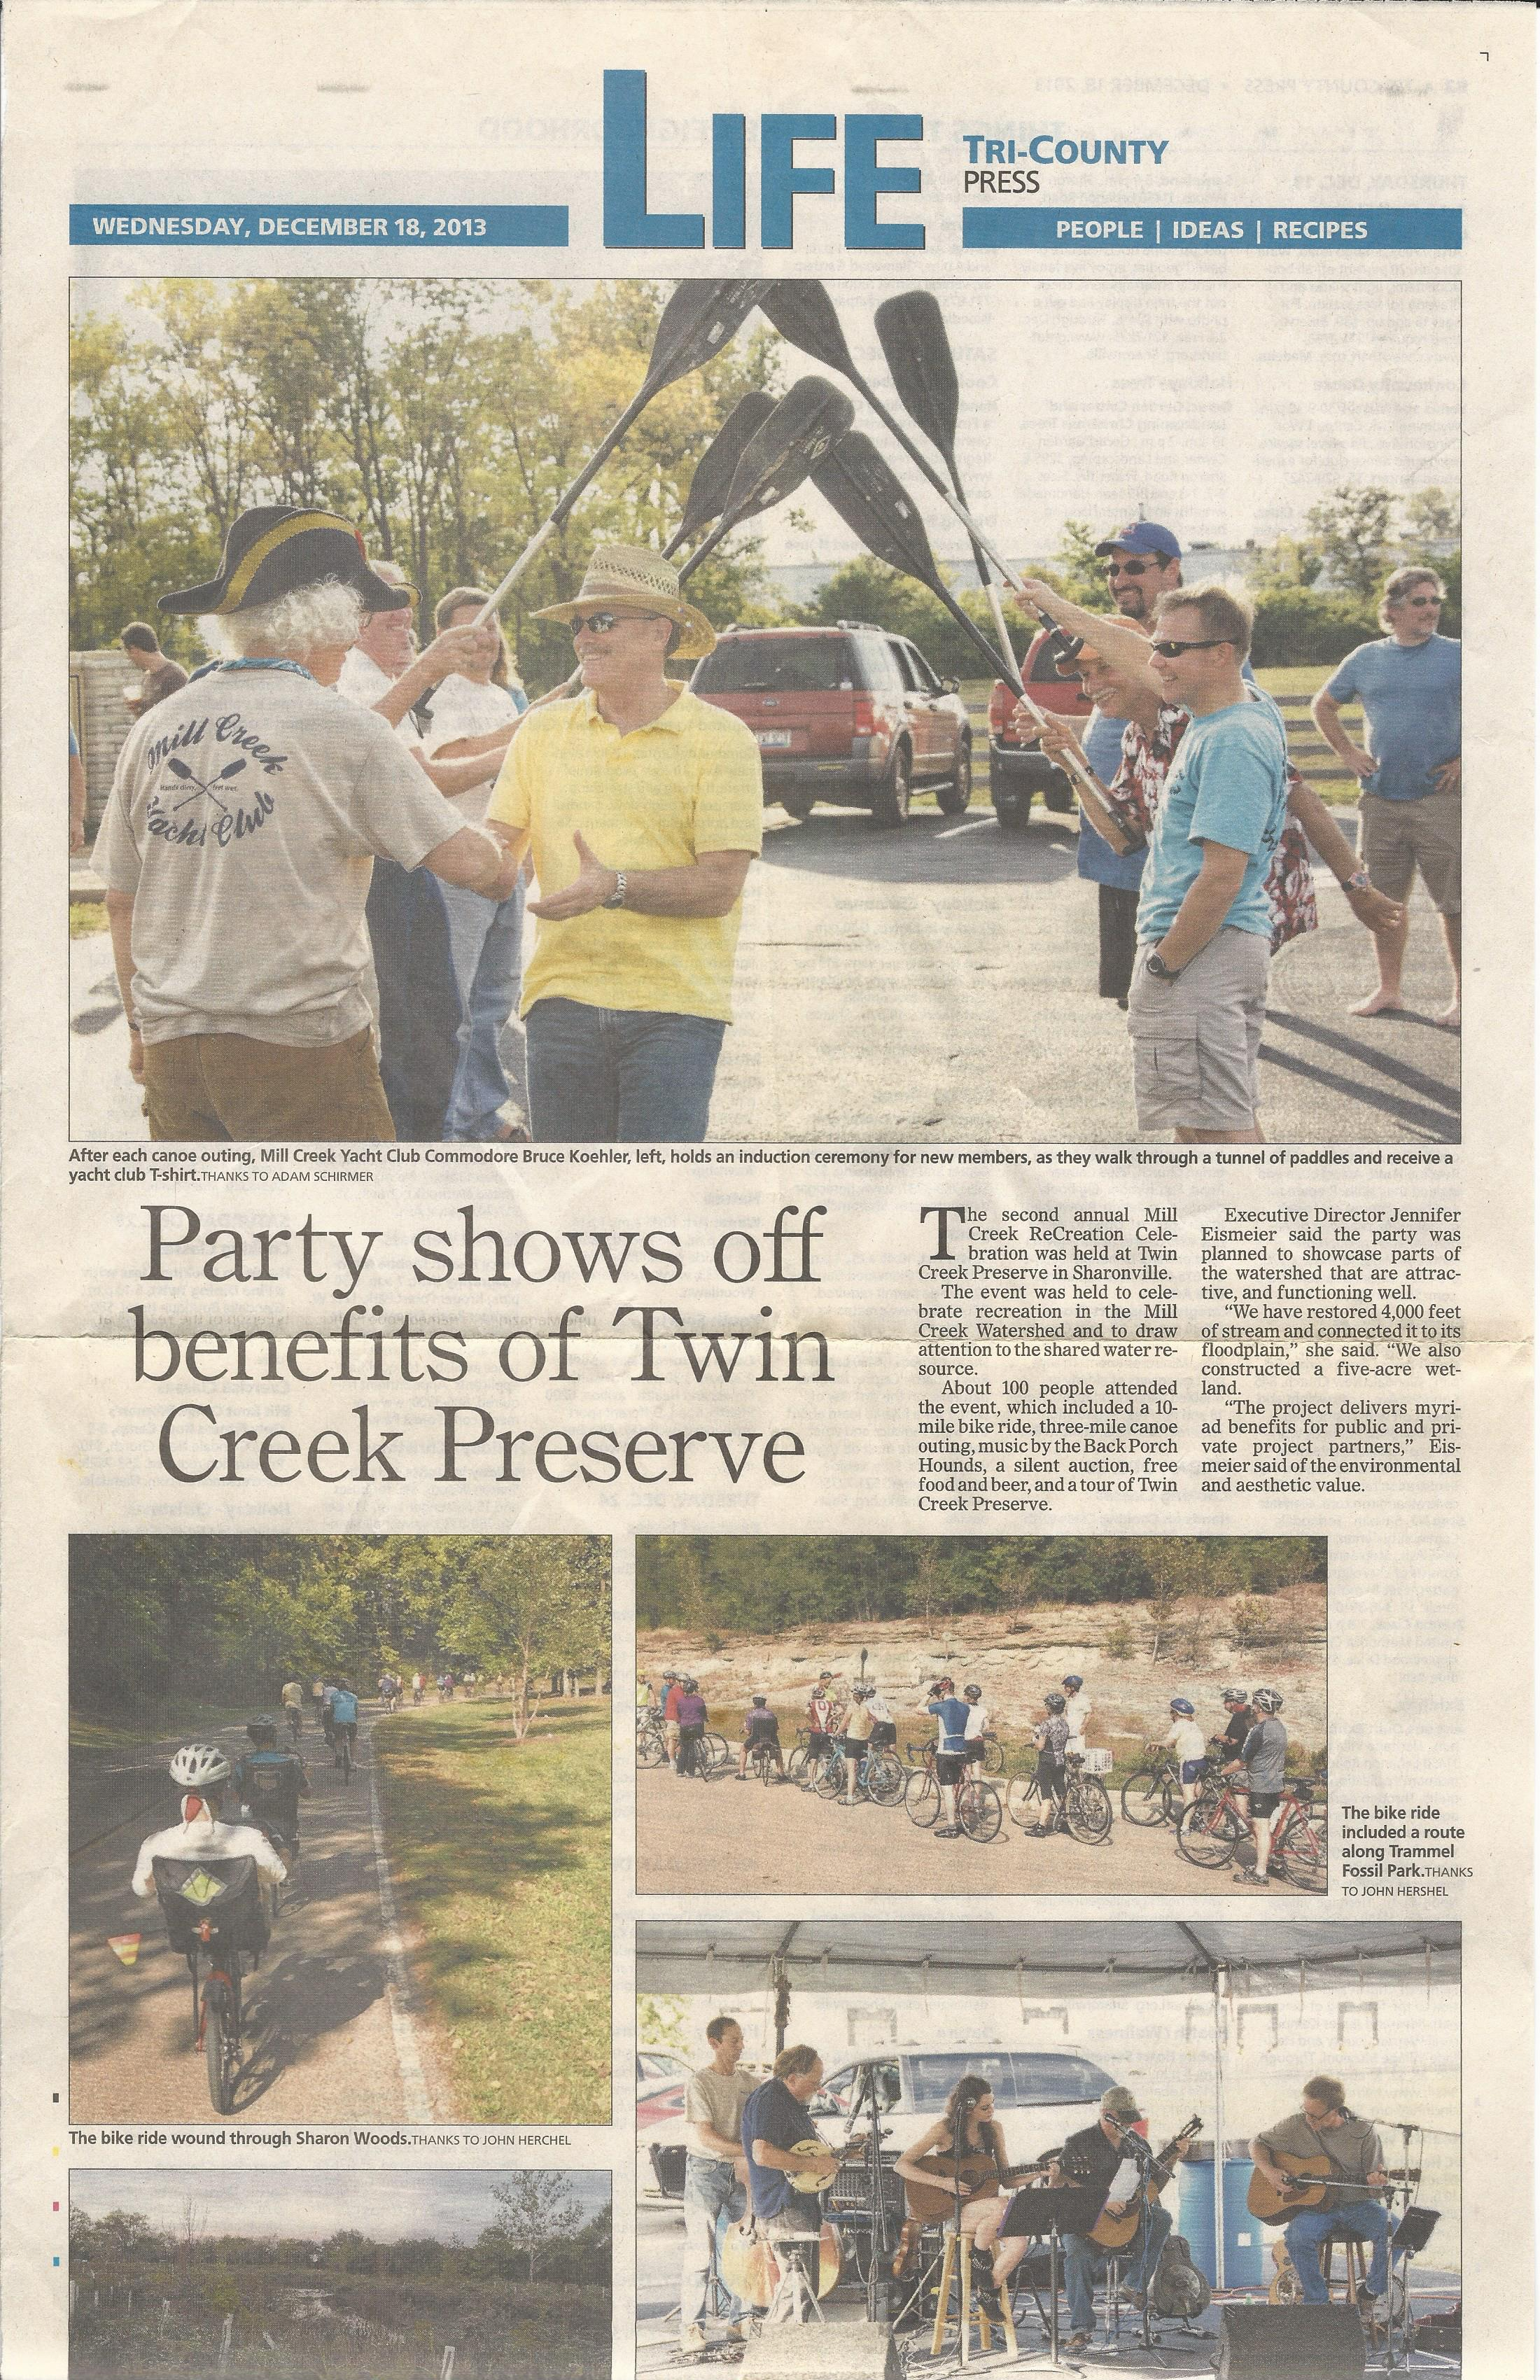 Tri-County Press_December 2013.jpg